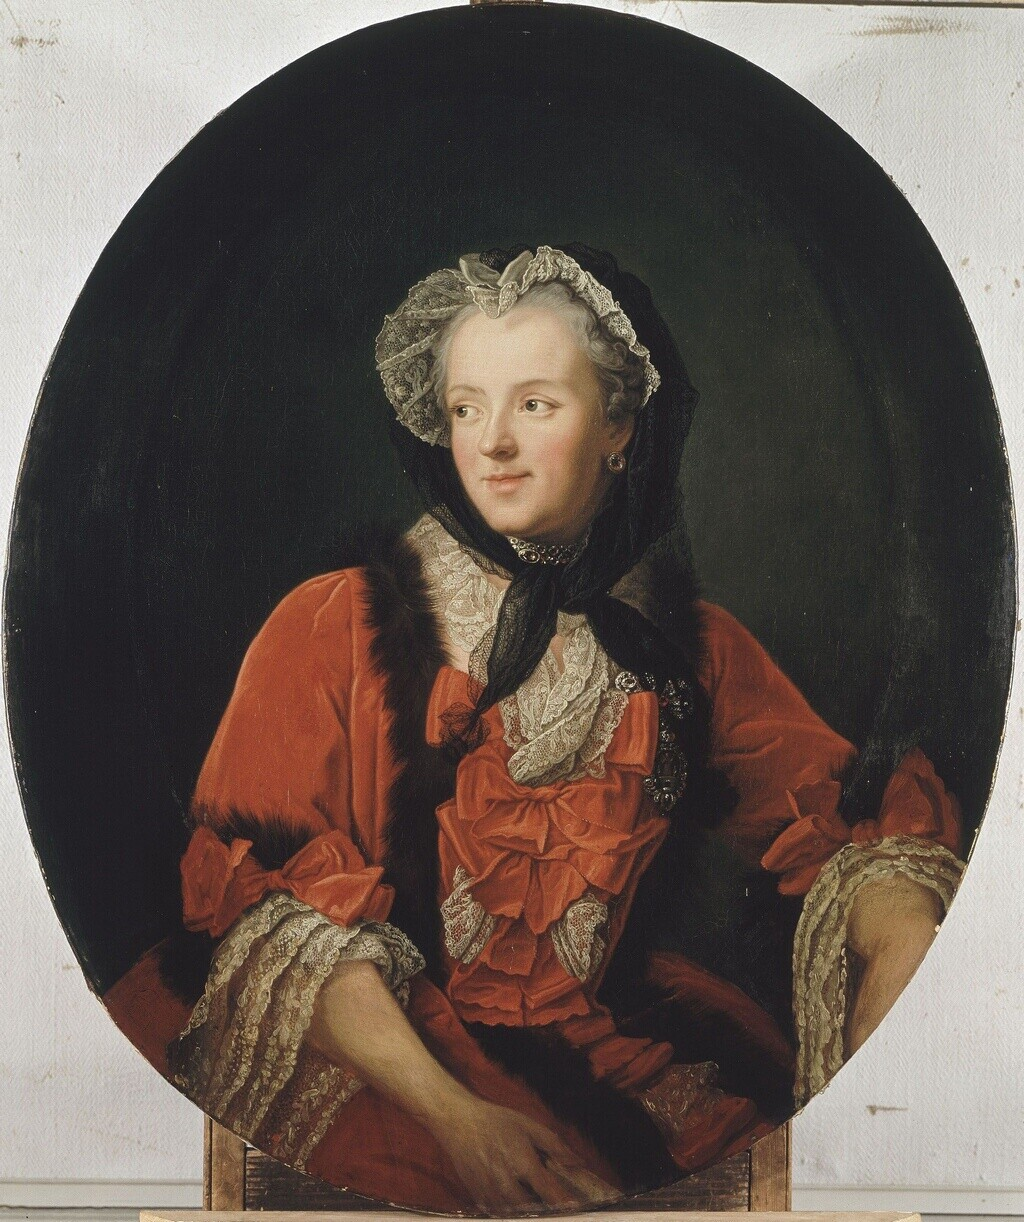 La reine Marie Leszczynska - Page 2 Imagep77